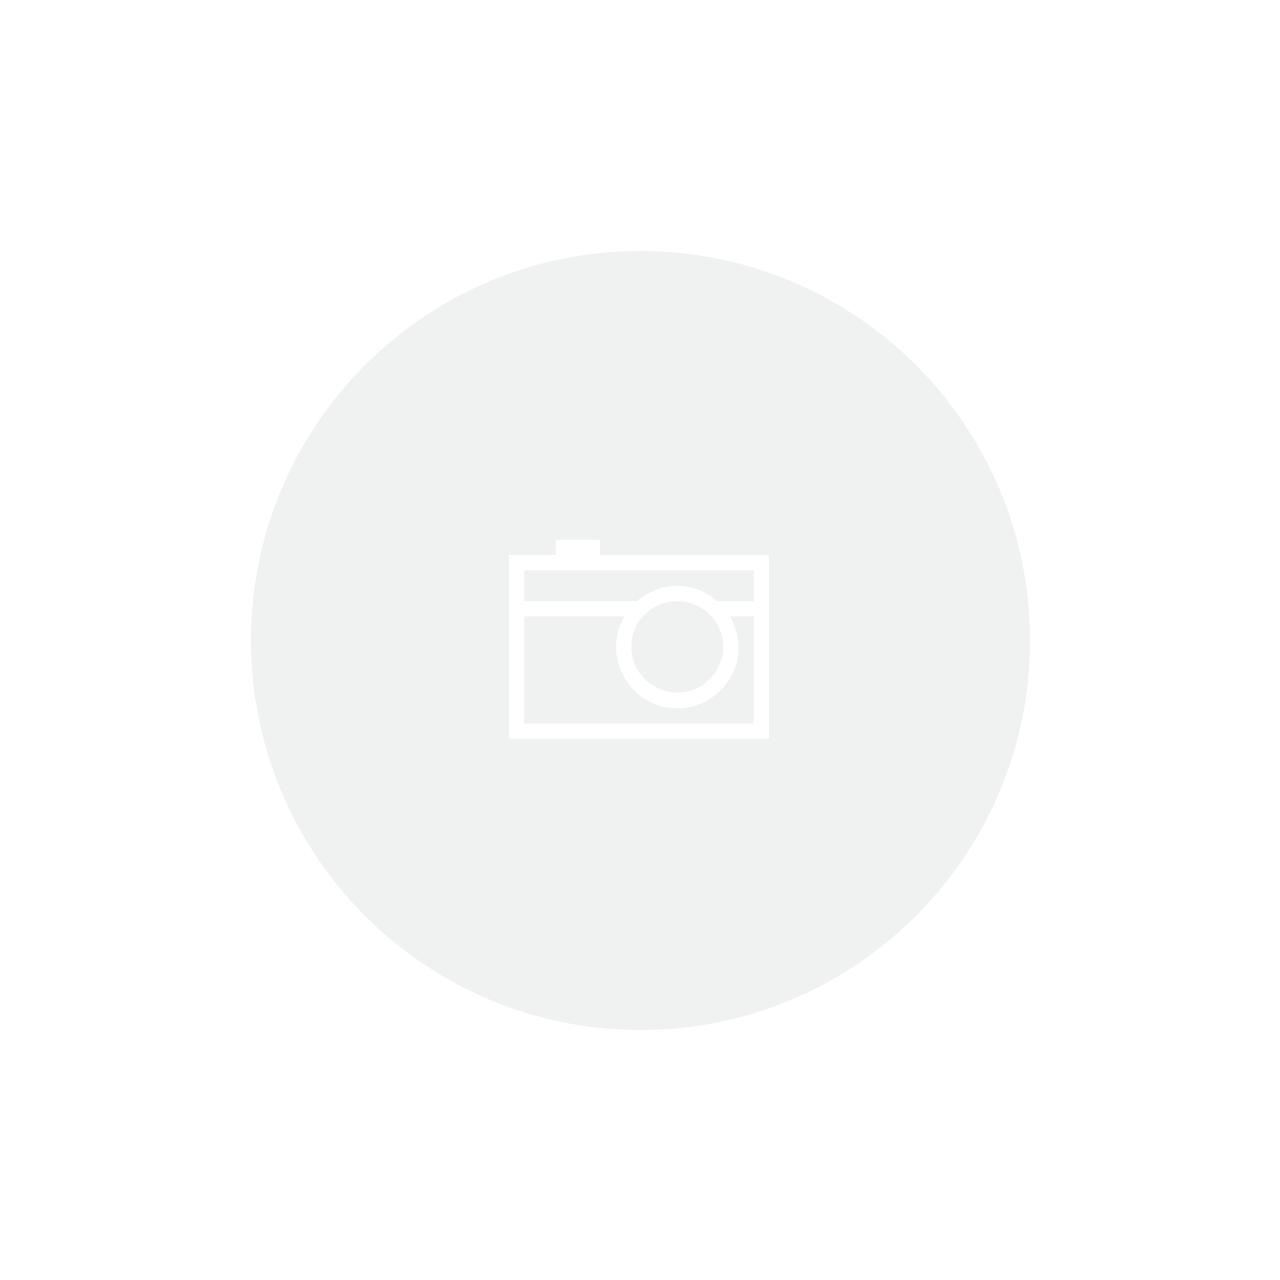 87 Grande Prova de Vinhos do Brasil